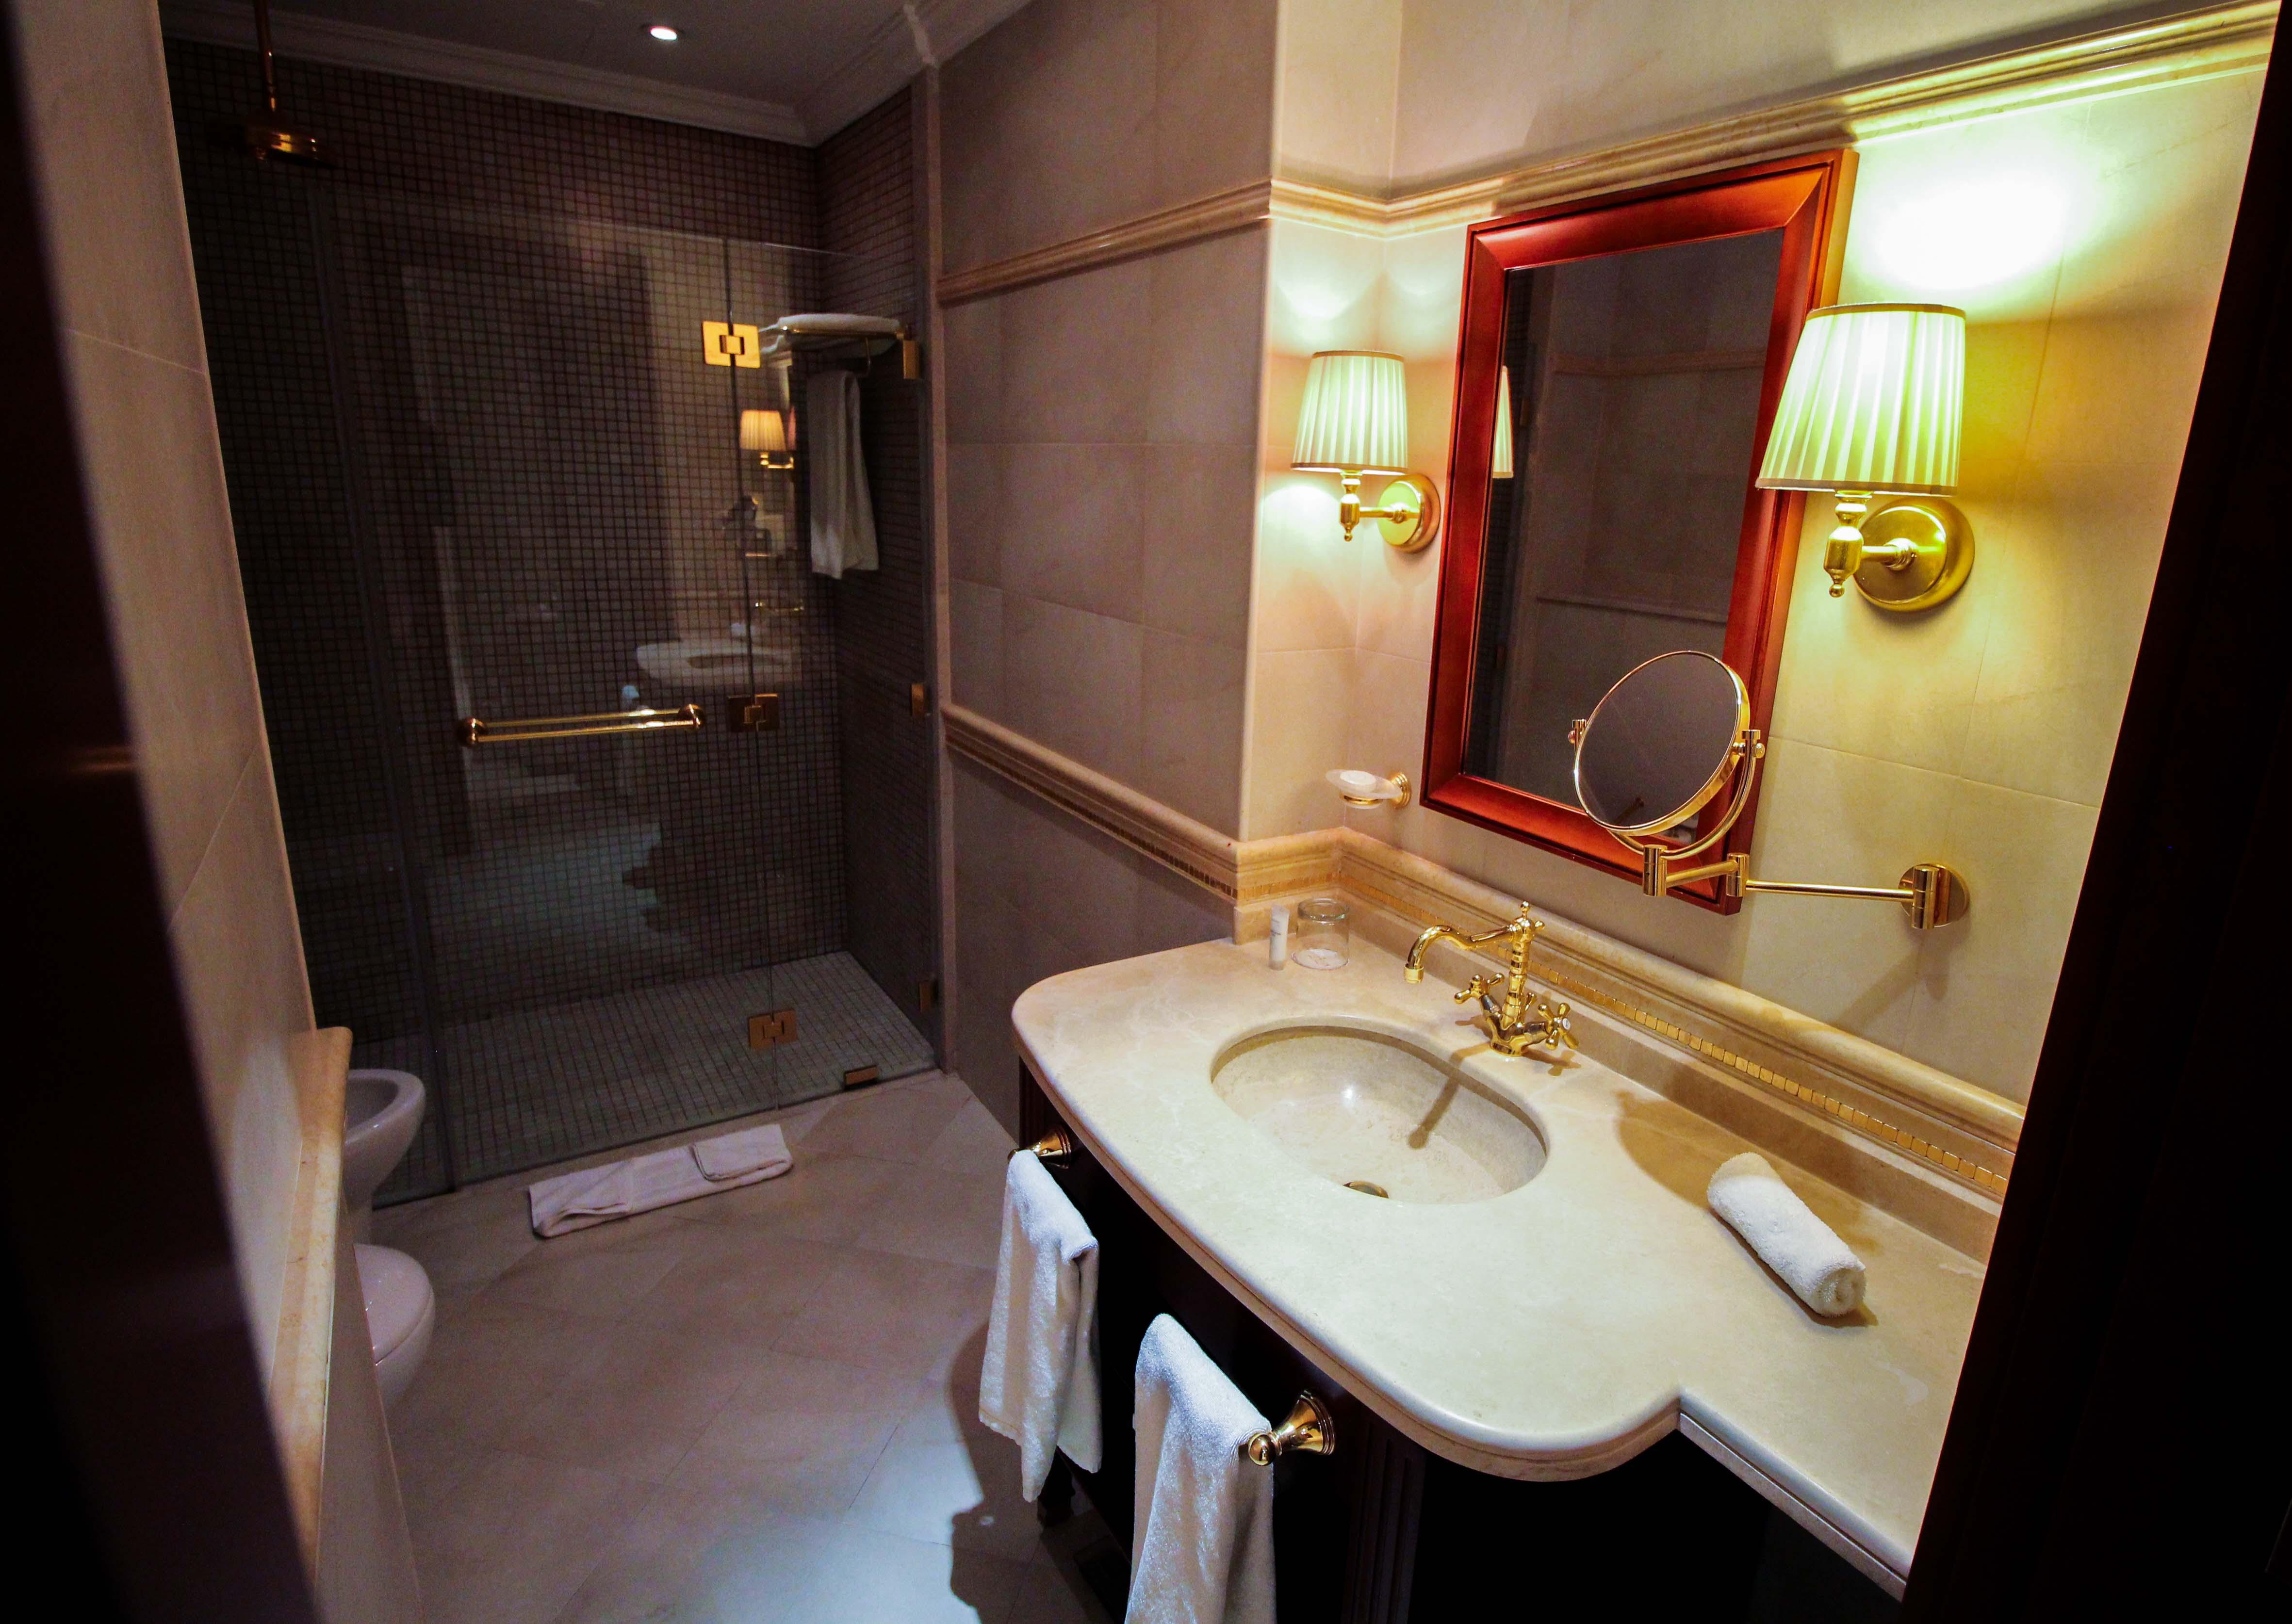 Warwick Hotel Doha Executive Room Badezimmer Luxushotel 5 Sterne Hotel Katar Qatar Reiseblog